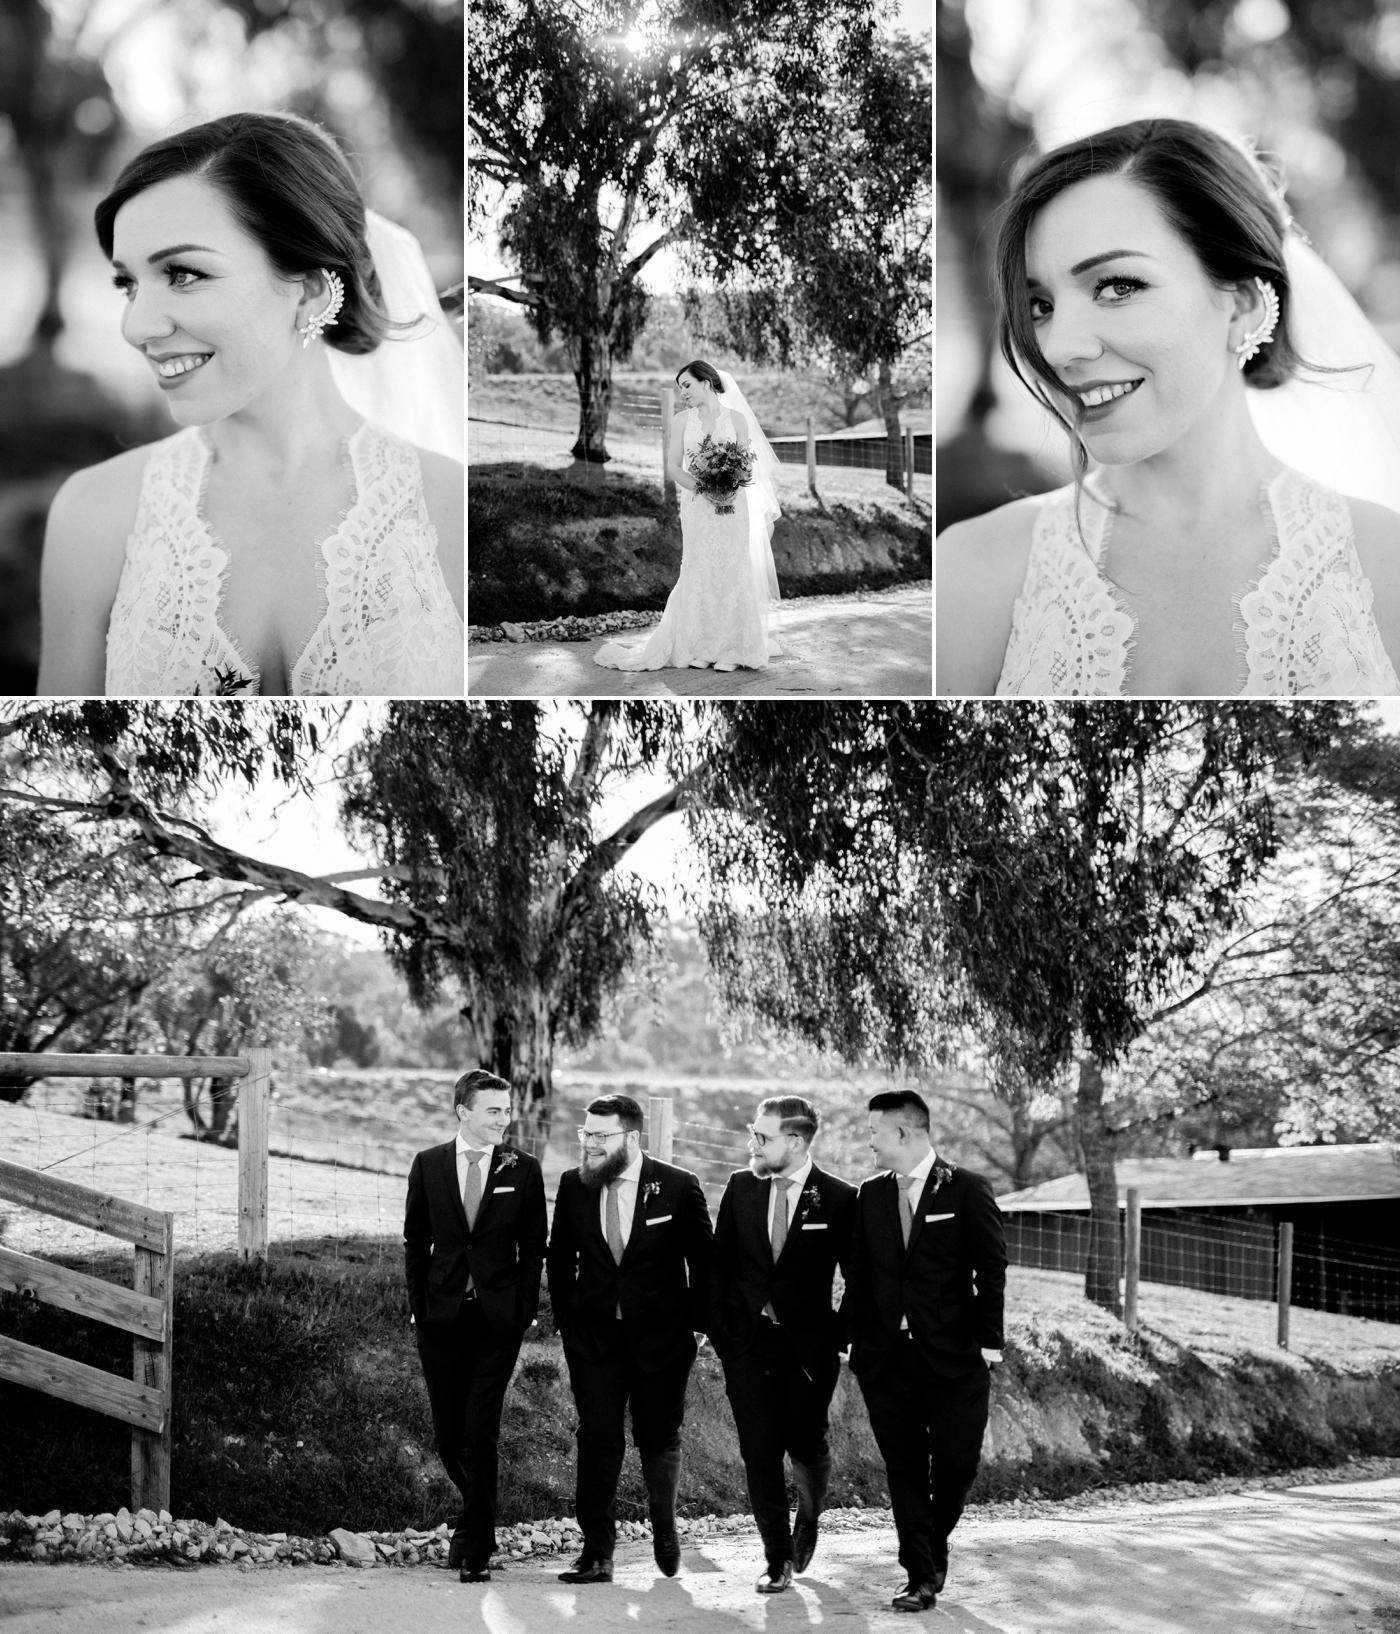 Erin & Ryan - Natural Wedding Photographer in Adelaide - Maximillians Wedding - Simple and Modern Wedding Photographer - Katherine Schultz - www.katherineschultzphotography.com_0040.jpg